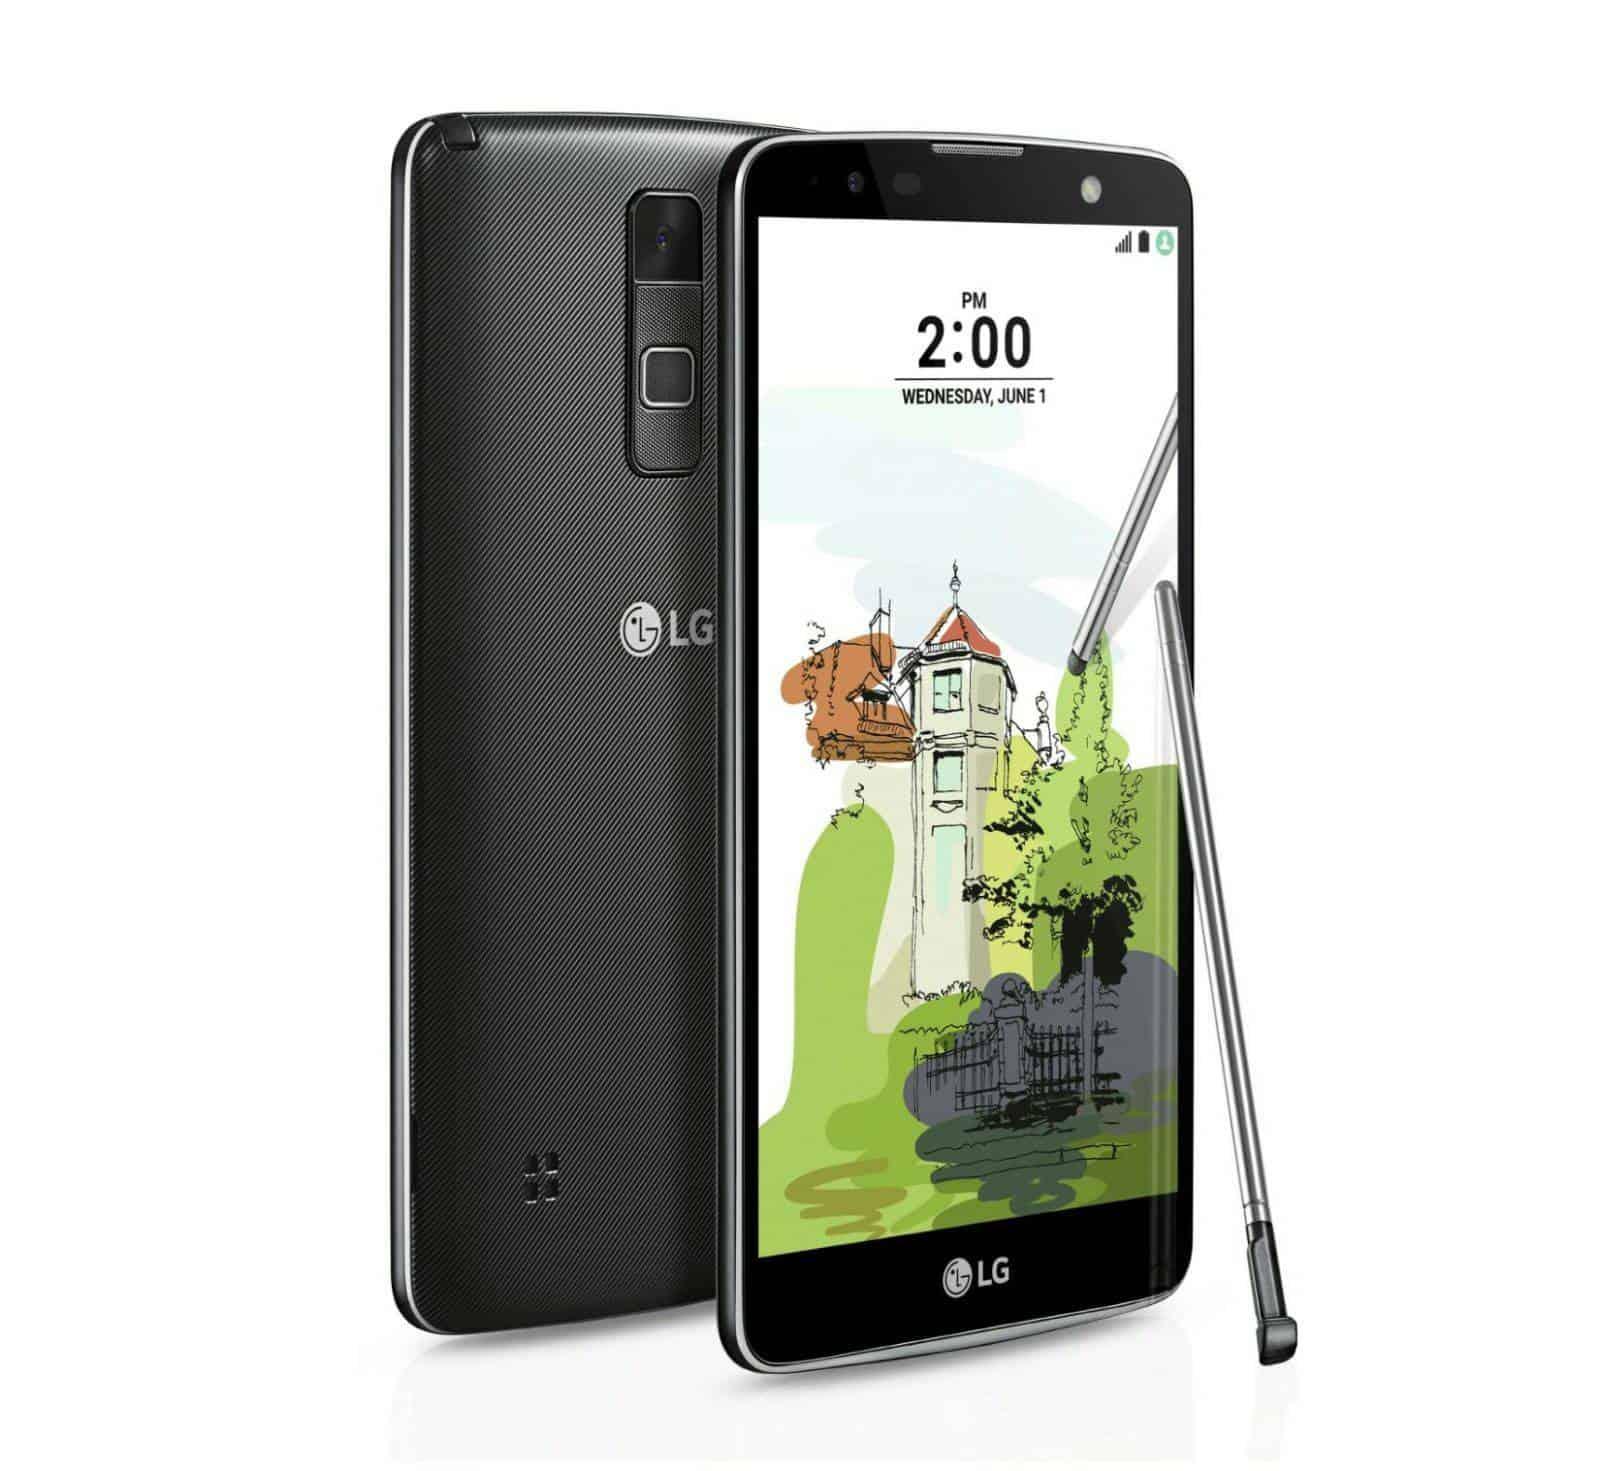 LG Stylo 2 Plus Lands At MetroPCS For 149 After Rebate